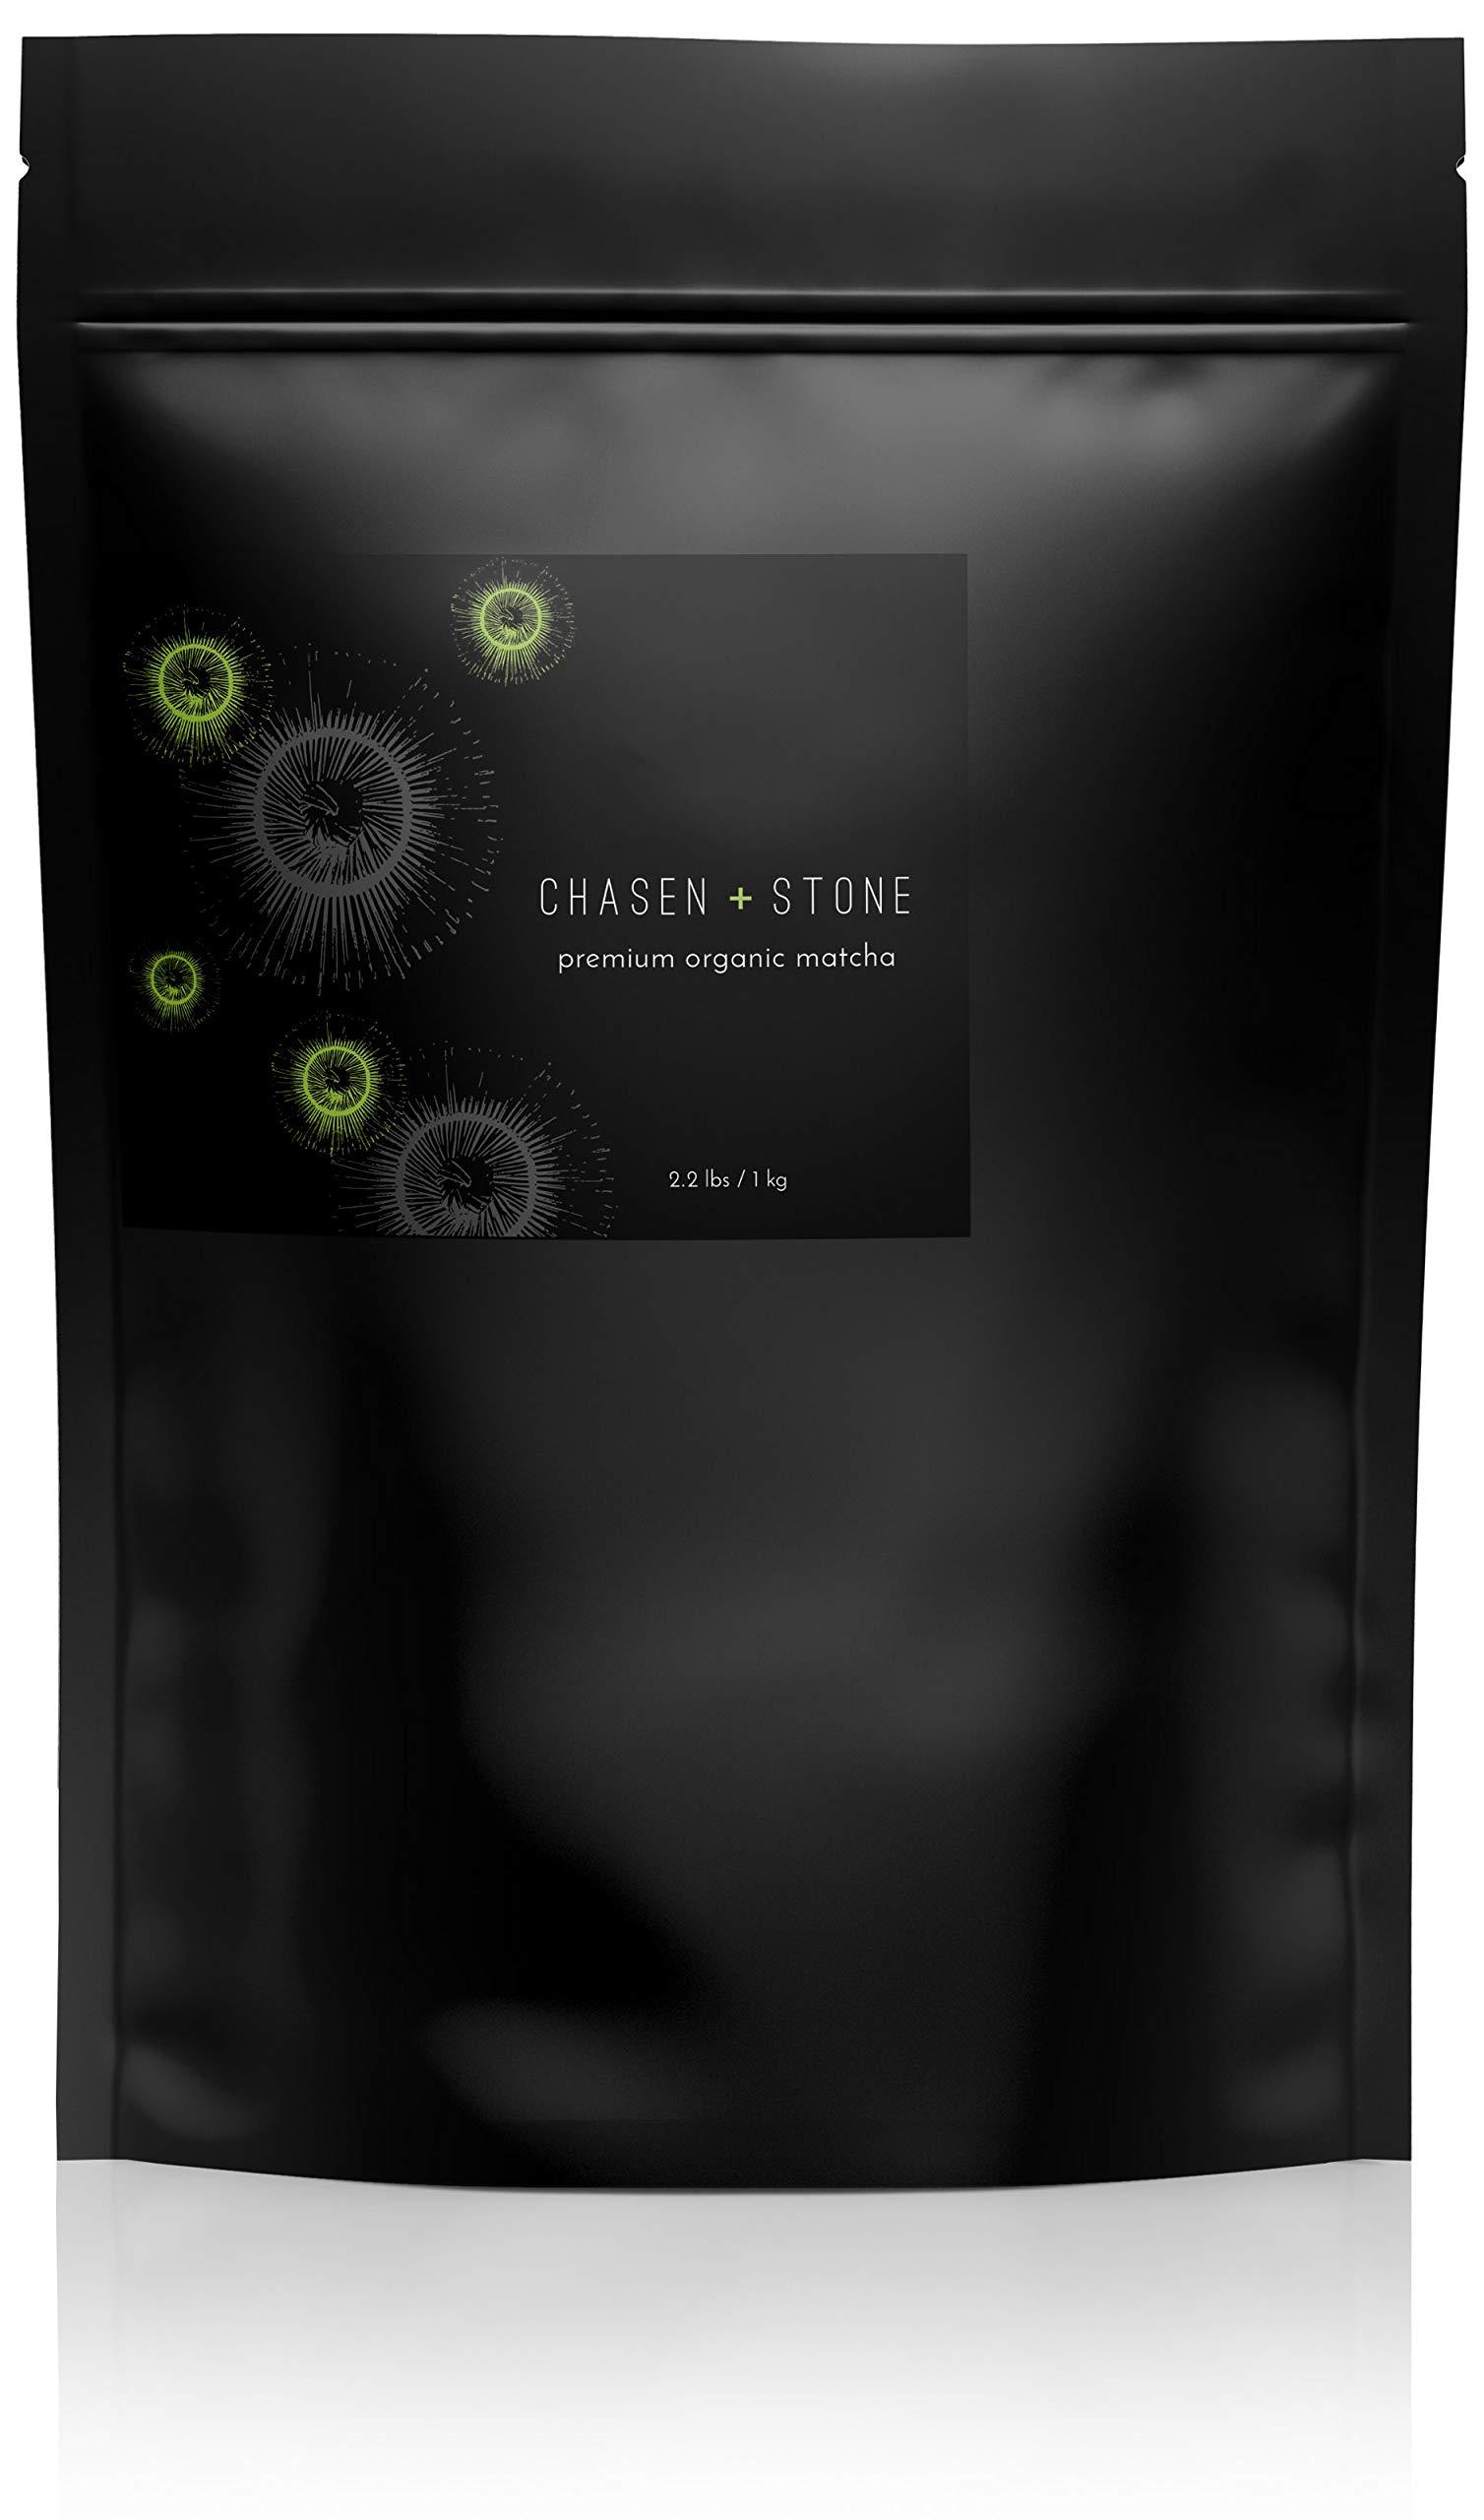 Chasen + Stone Premium Organic Matcha {1 Kg} by Chasen + Stone (Image #1)